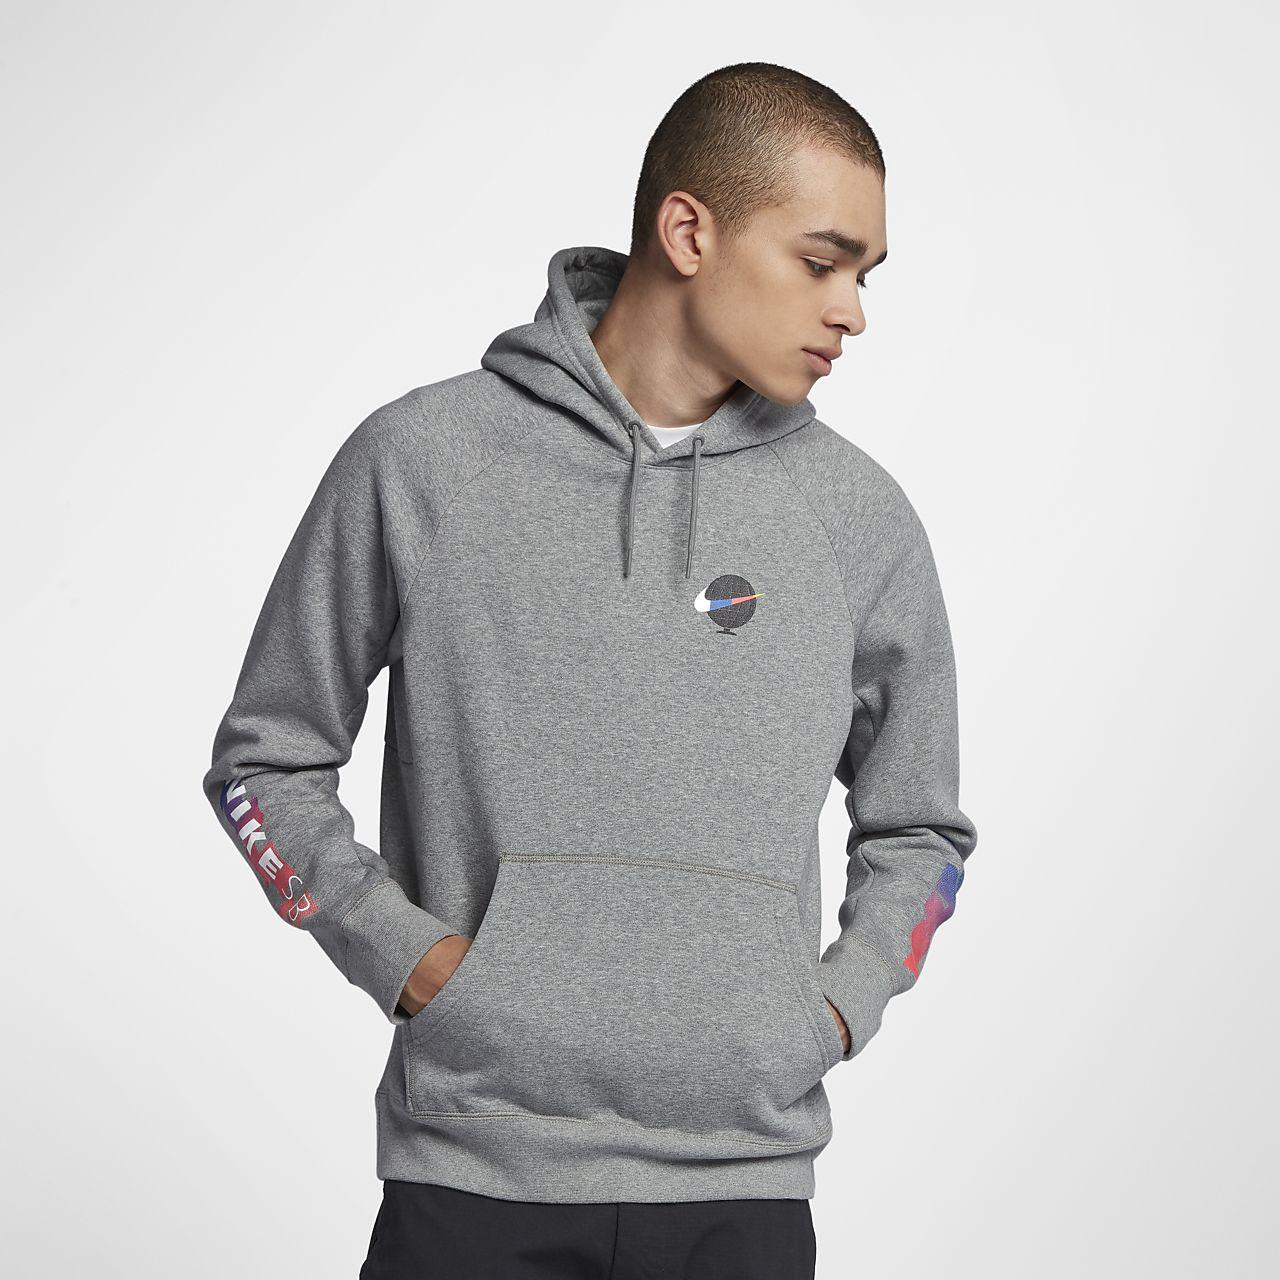 7a72ffb1e9 Sweat à capuche Nike SB Icon pour Homme. Nike.com CA